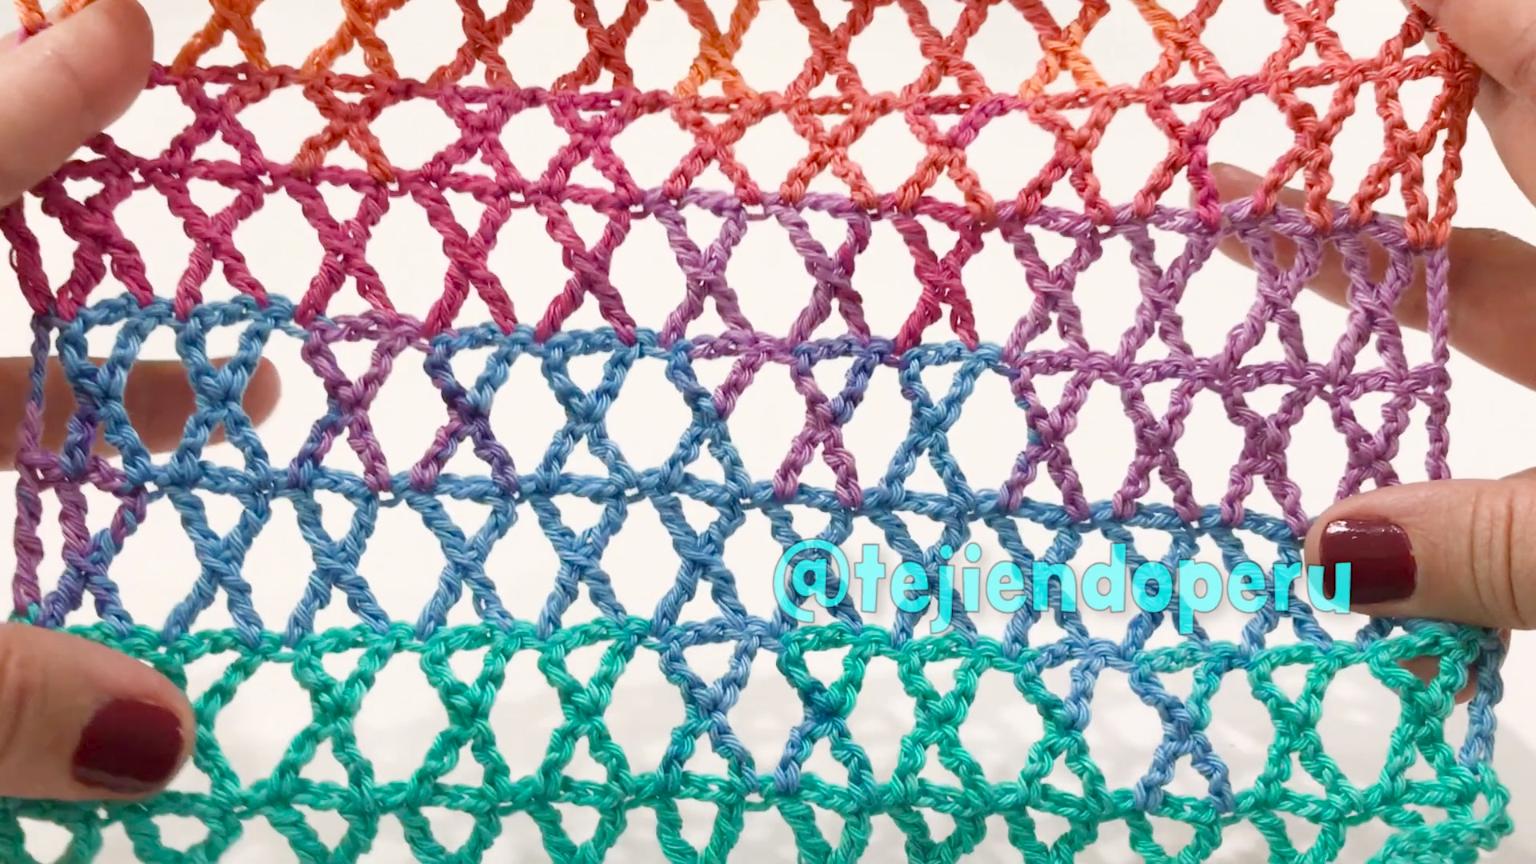 Punto K tejiodo a crochet... ¡lindo y fácil! Crochet K stitch ... 2e1d30ad5469